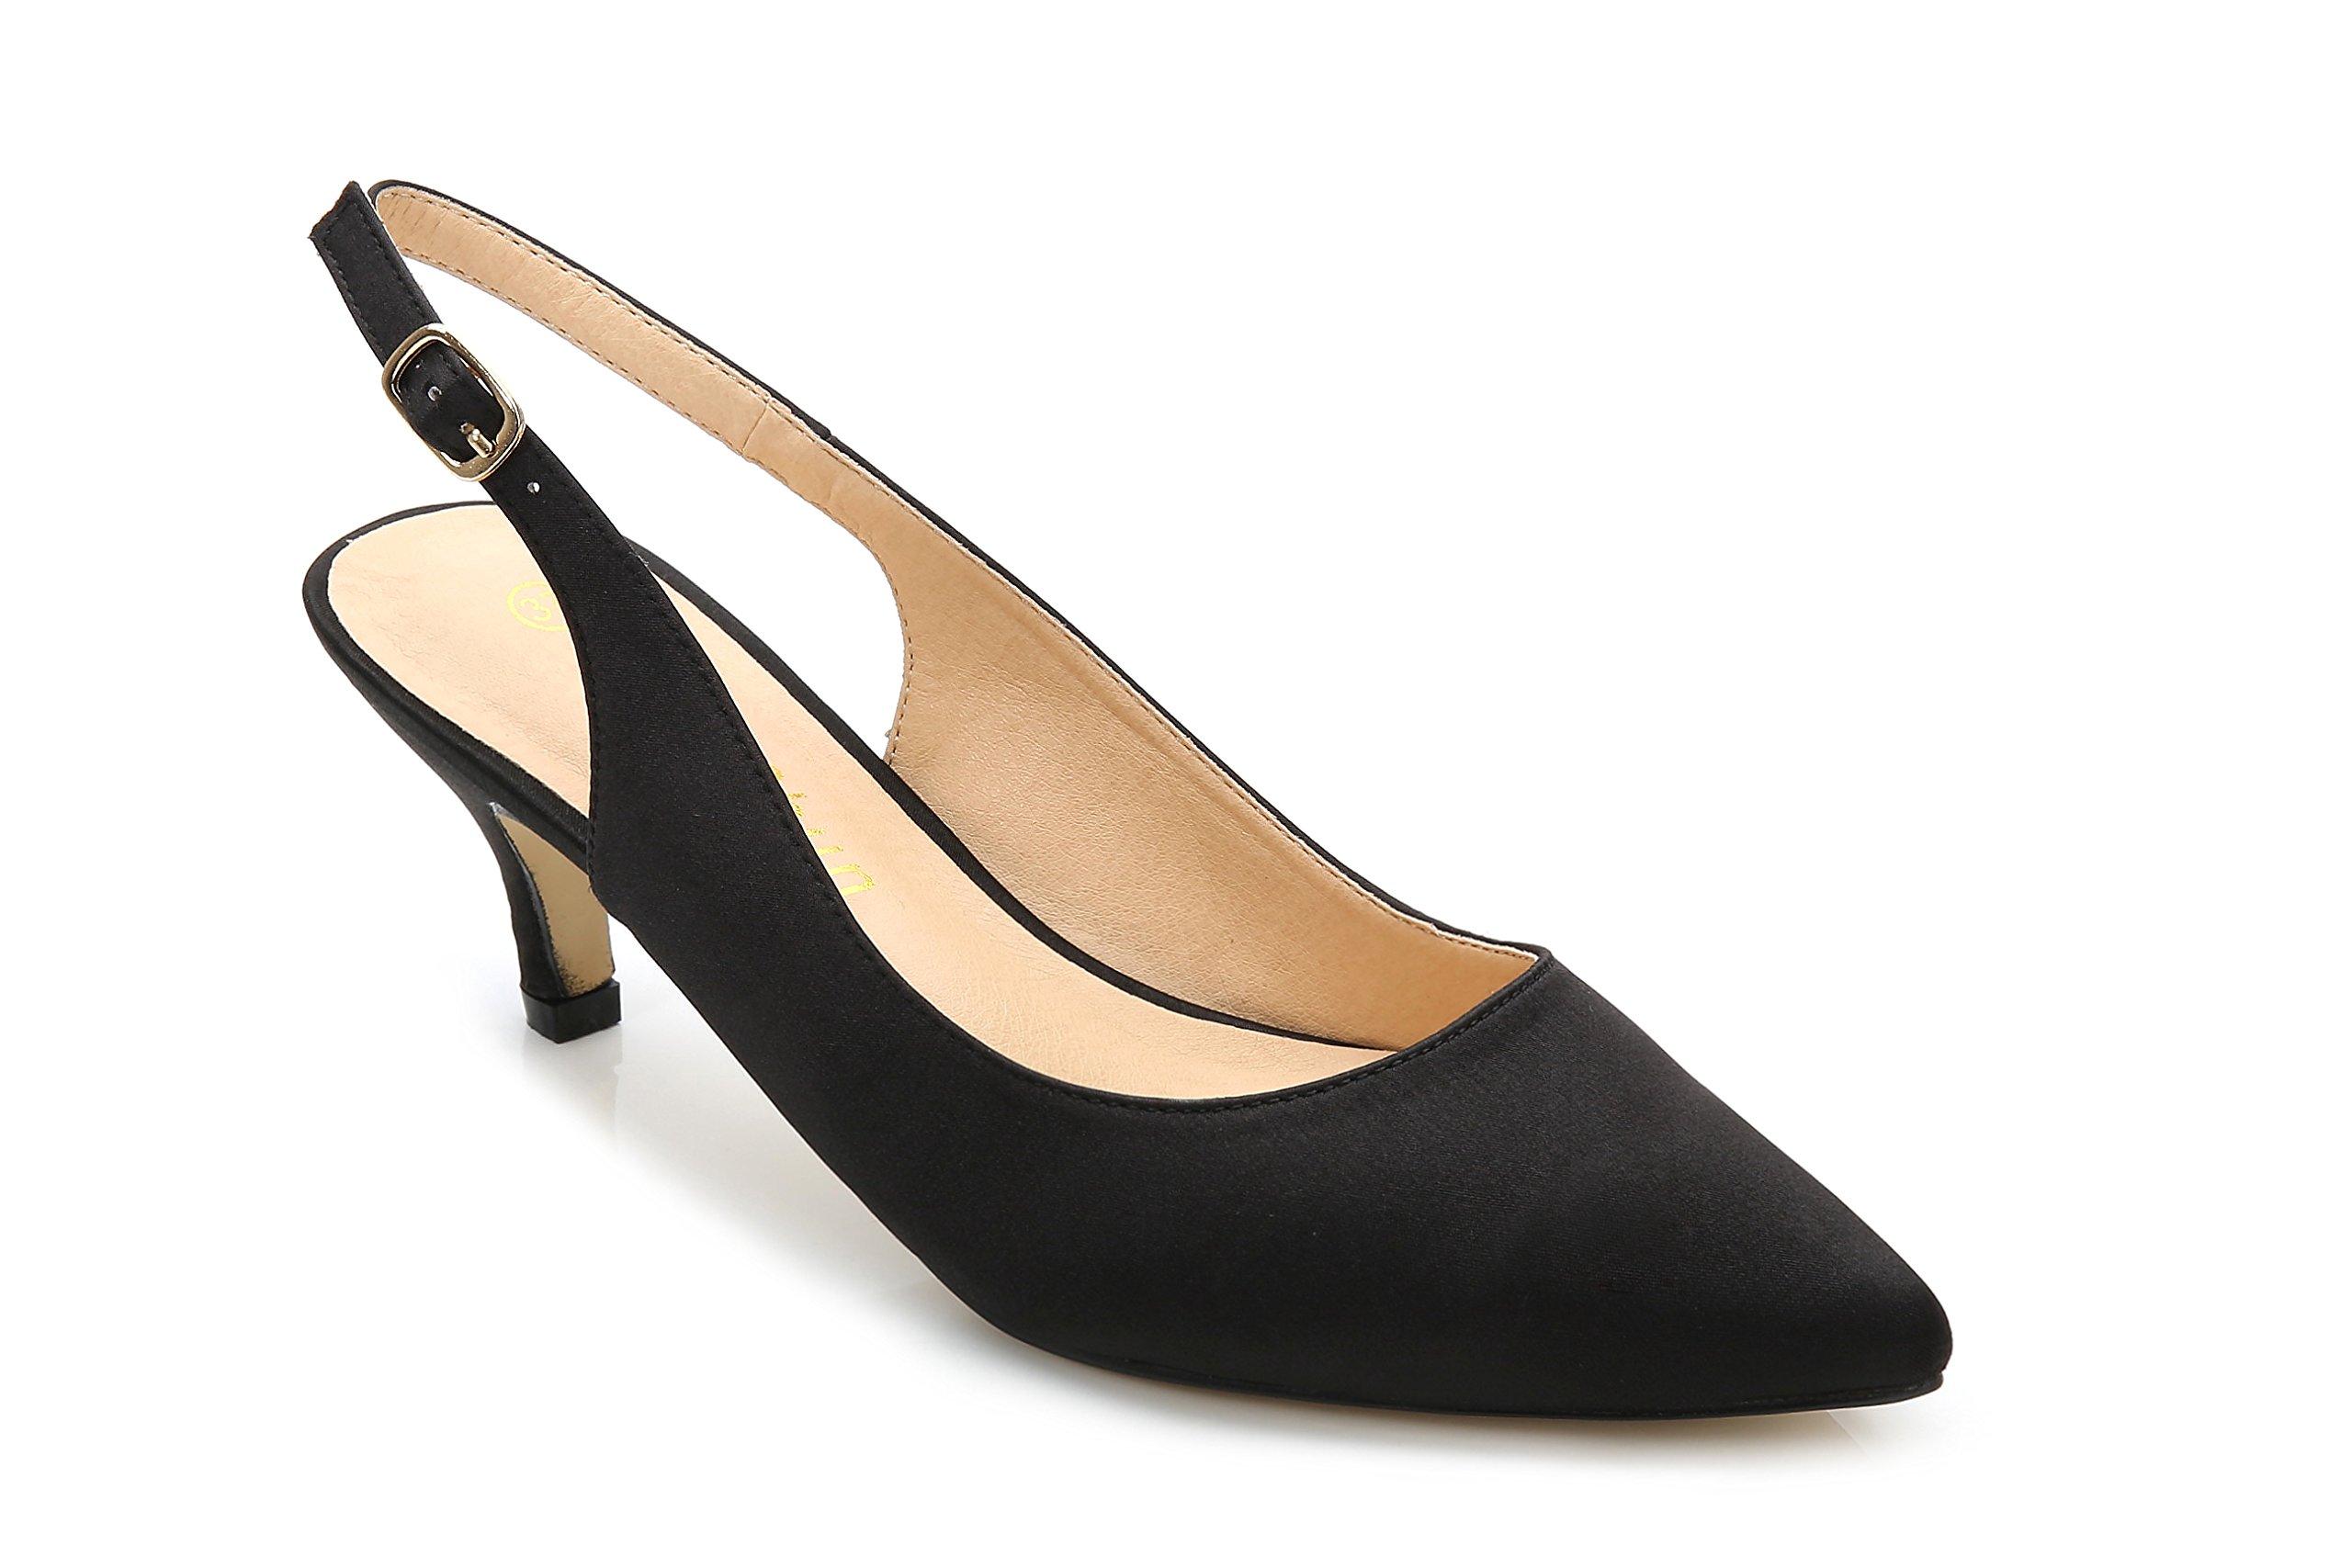 ComeShun Womens Shoes Classic Kitten Heels Slingback Dress Pumps (9 US/40 EU, Black)